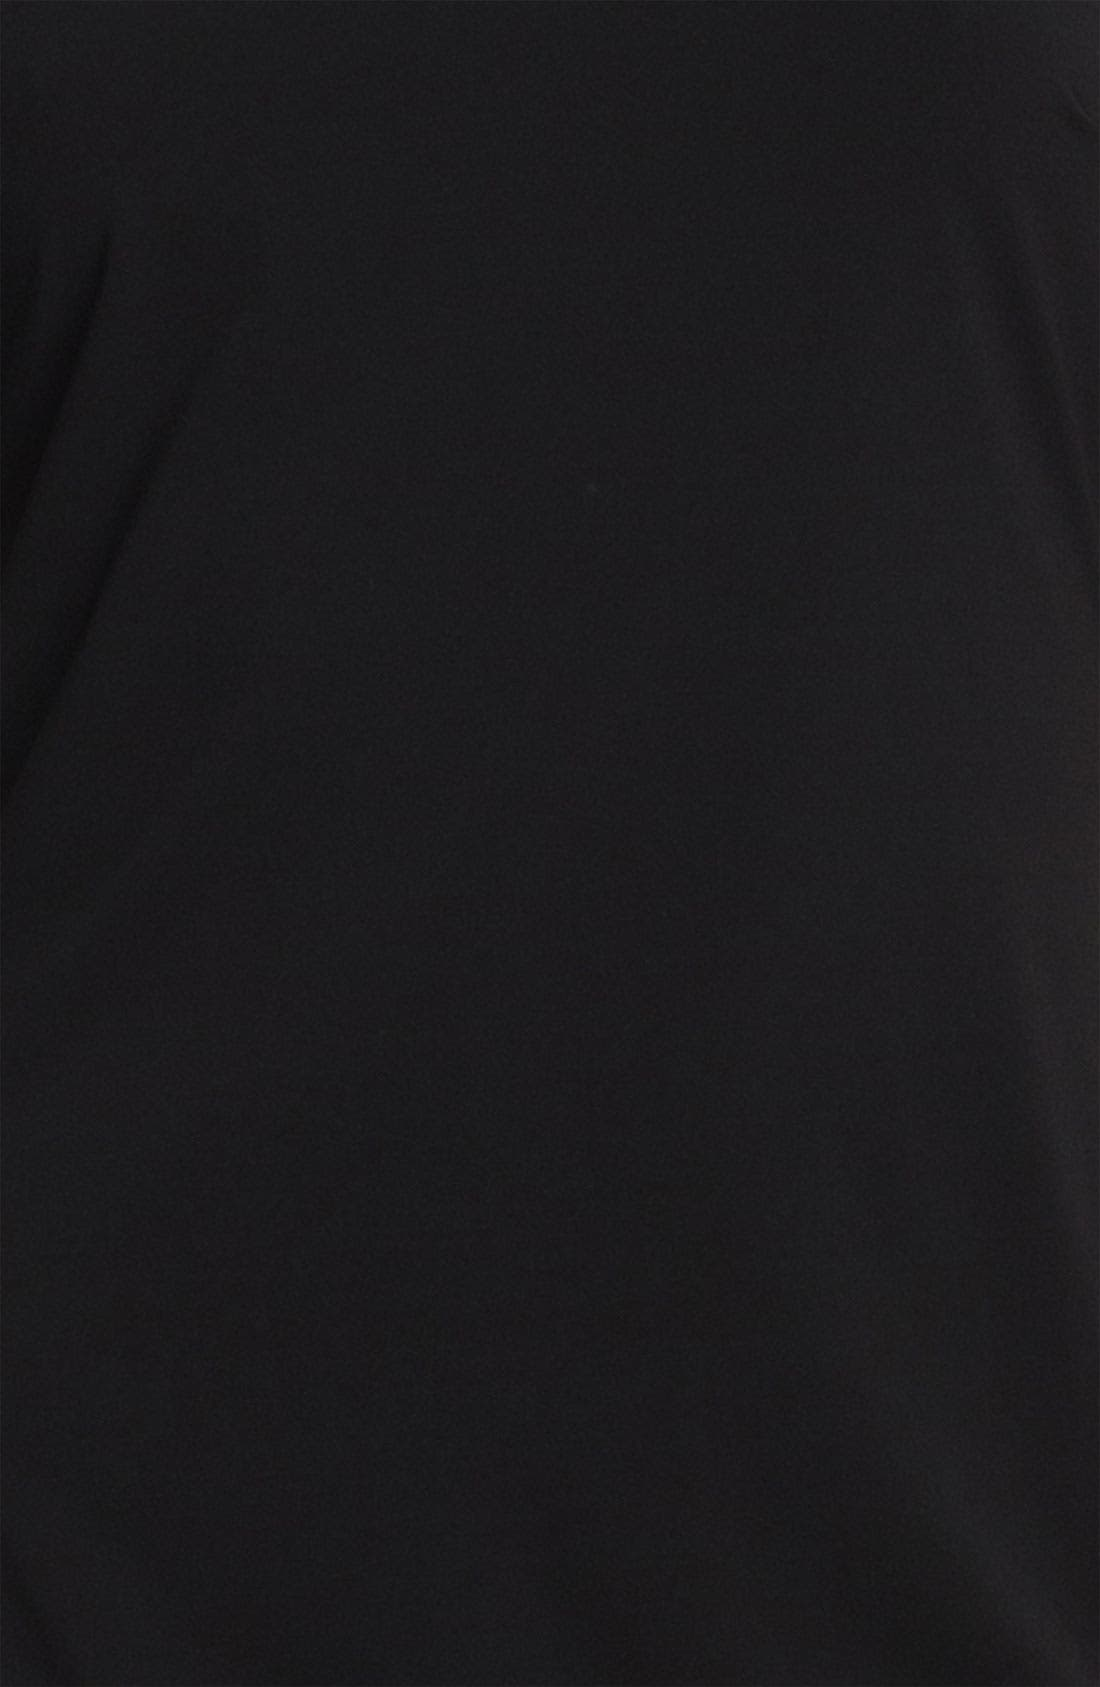 Sleeveless Sheath Dress,                             Alternate thumbnail 3, color,                             001